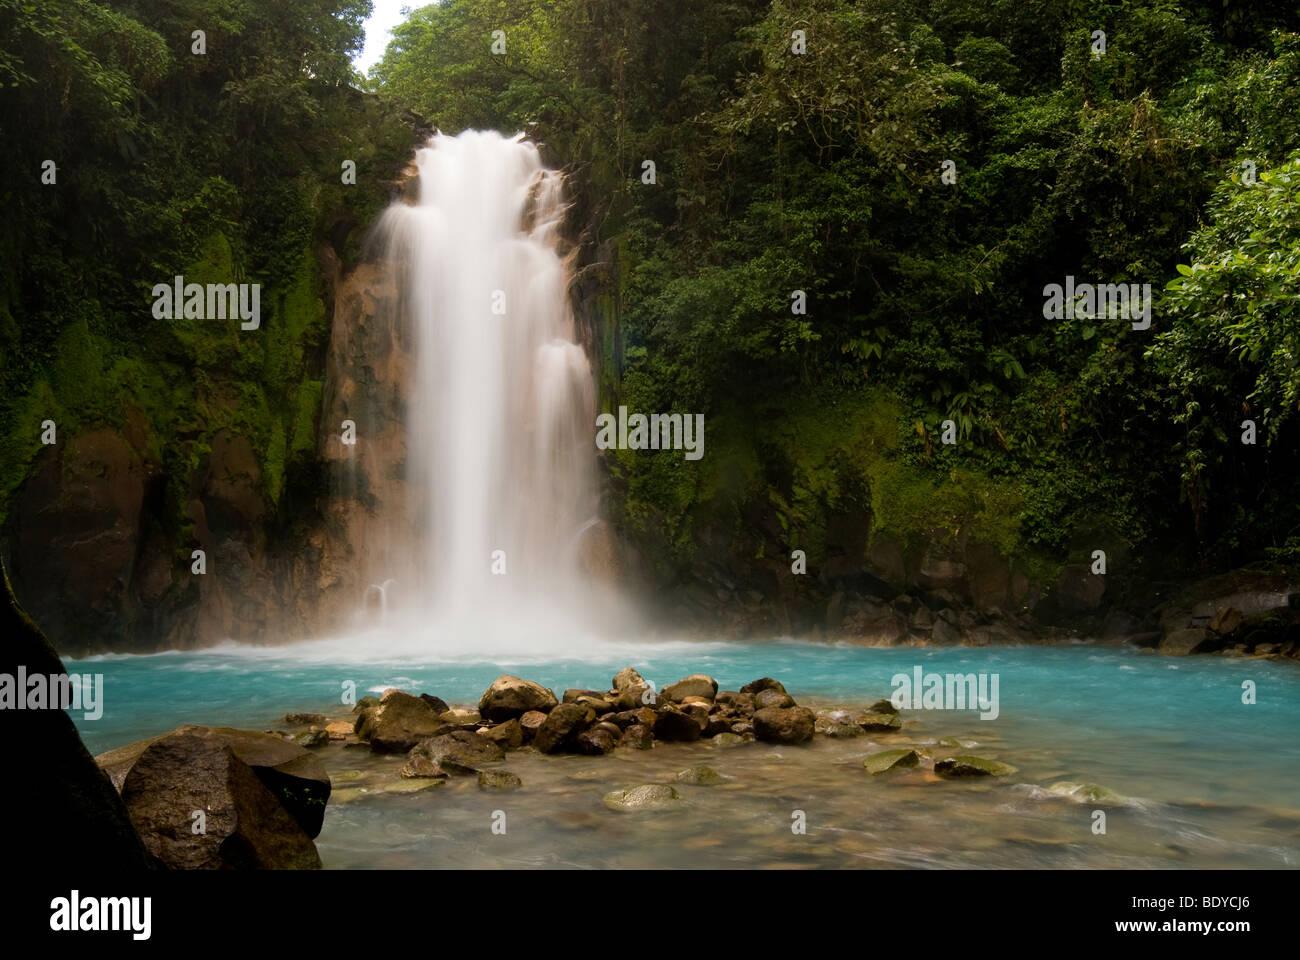 Waterfall at Rio Celeste, Tenorio Volcano National Park, Costa Rica. - Stock Image